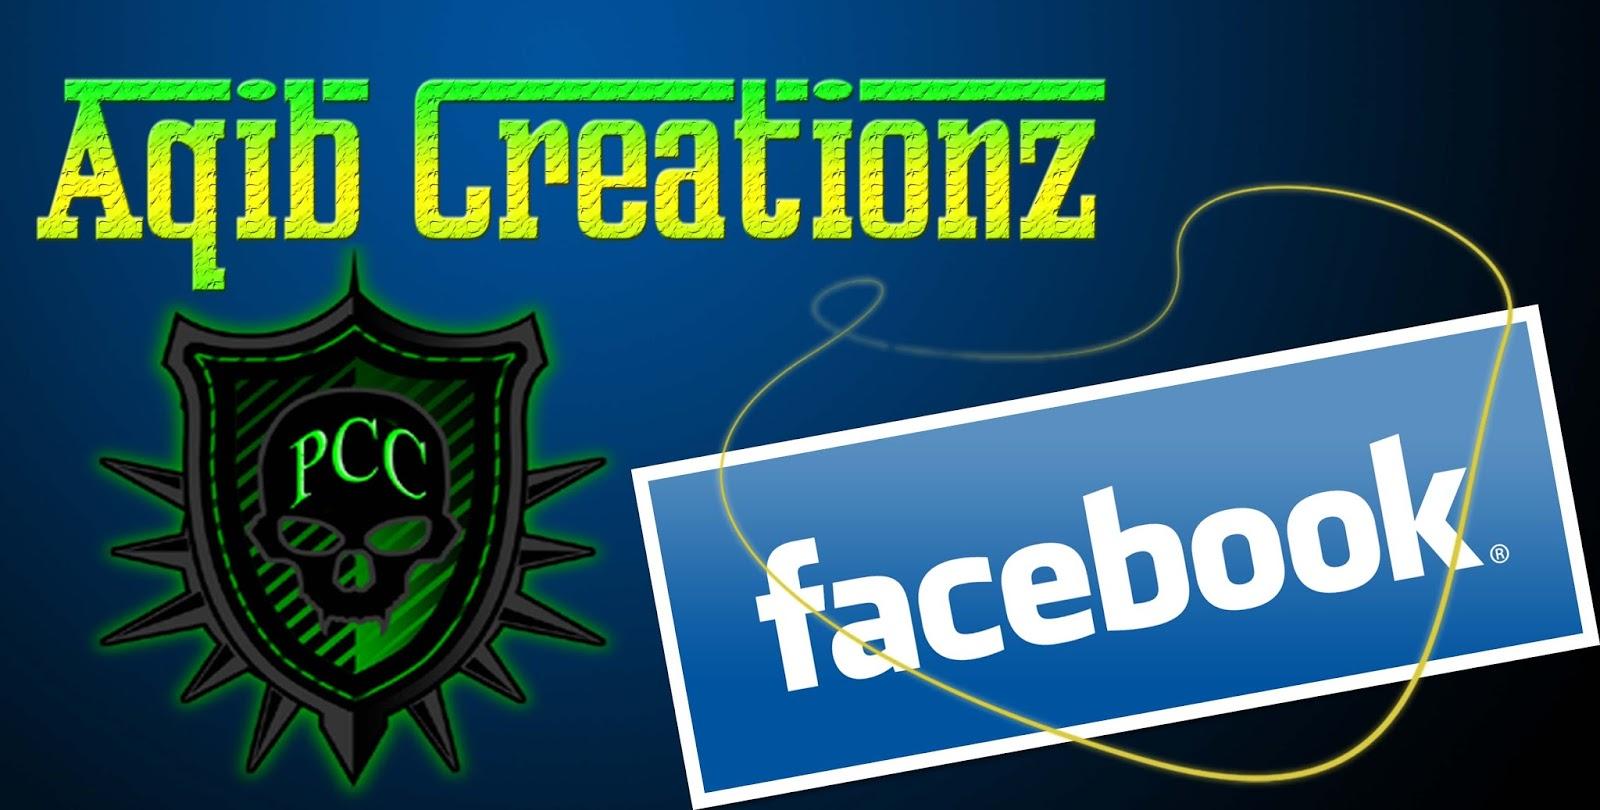 New Method To Verify Facebook ACcount - Aqib Creationz